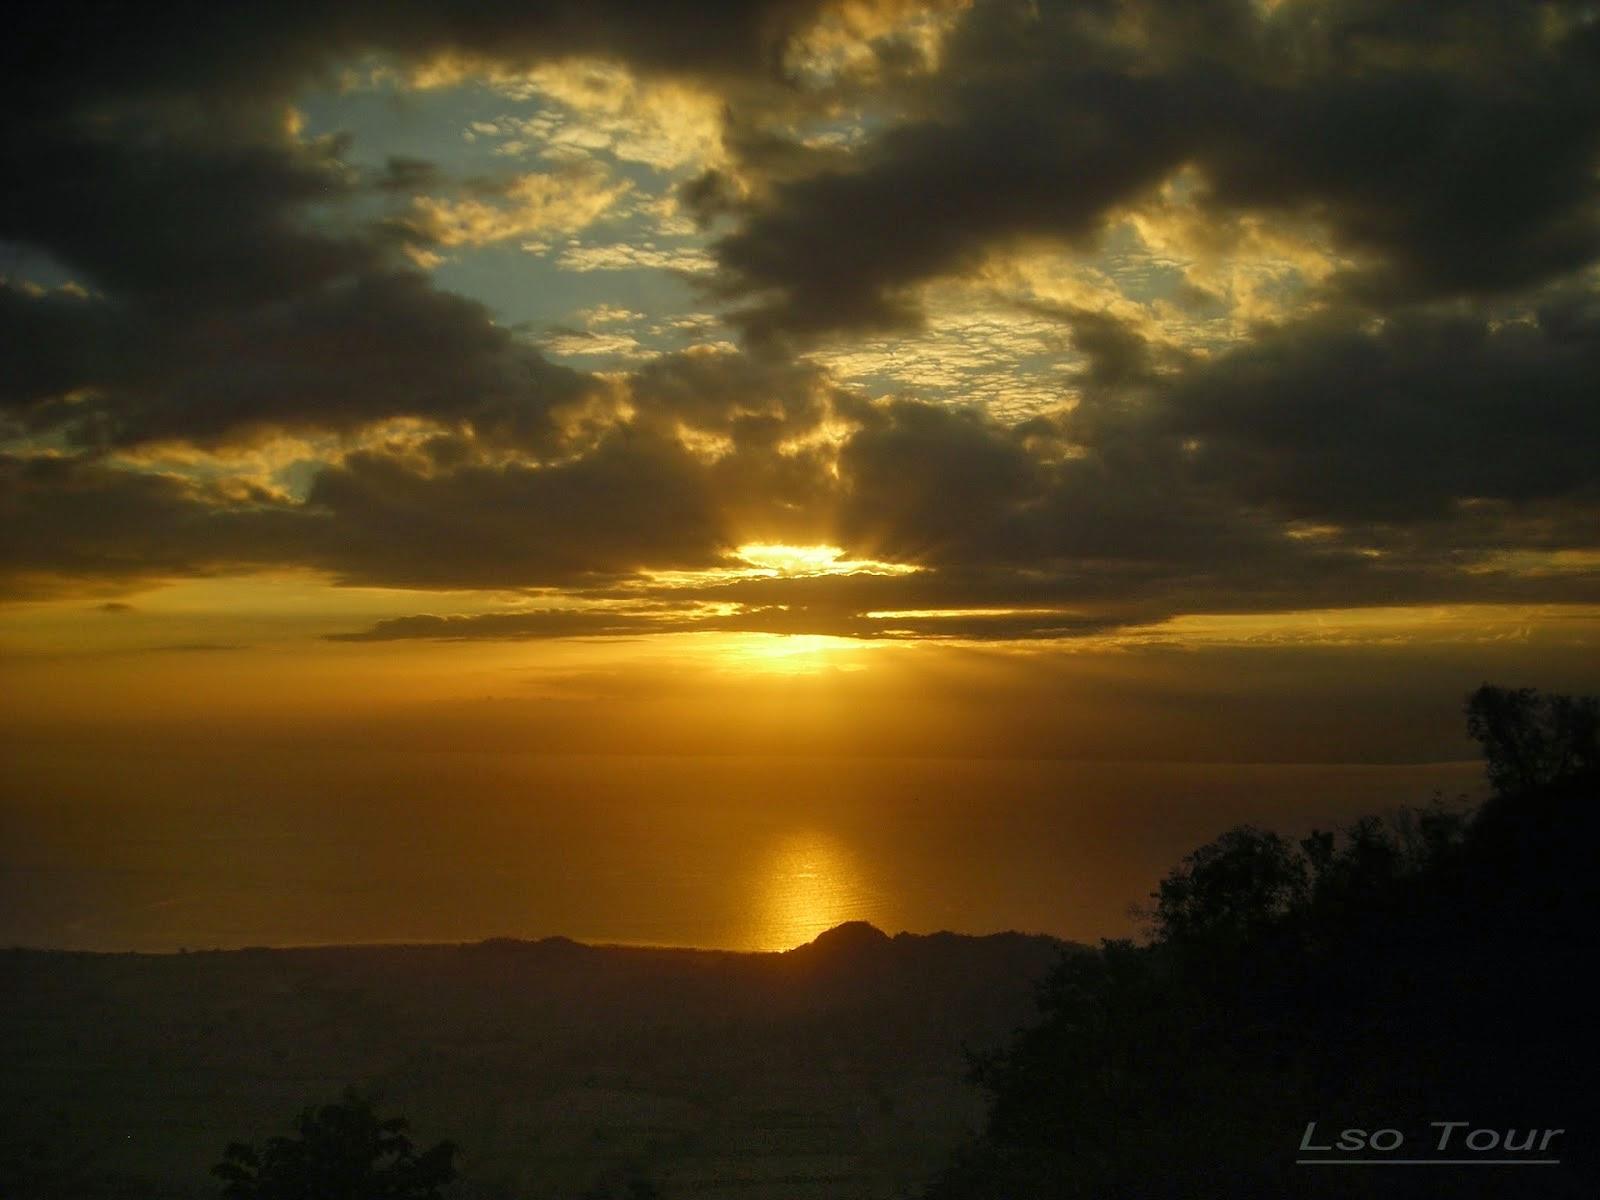 Pemandangan Sunset Terindah Wajib DiKunjungi Sekilas Info